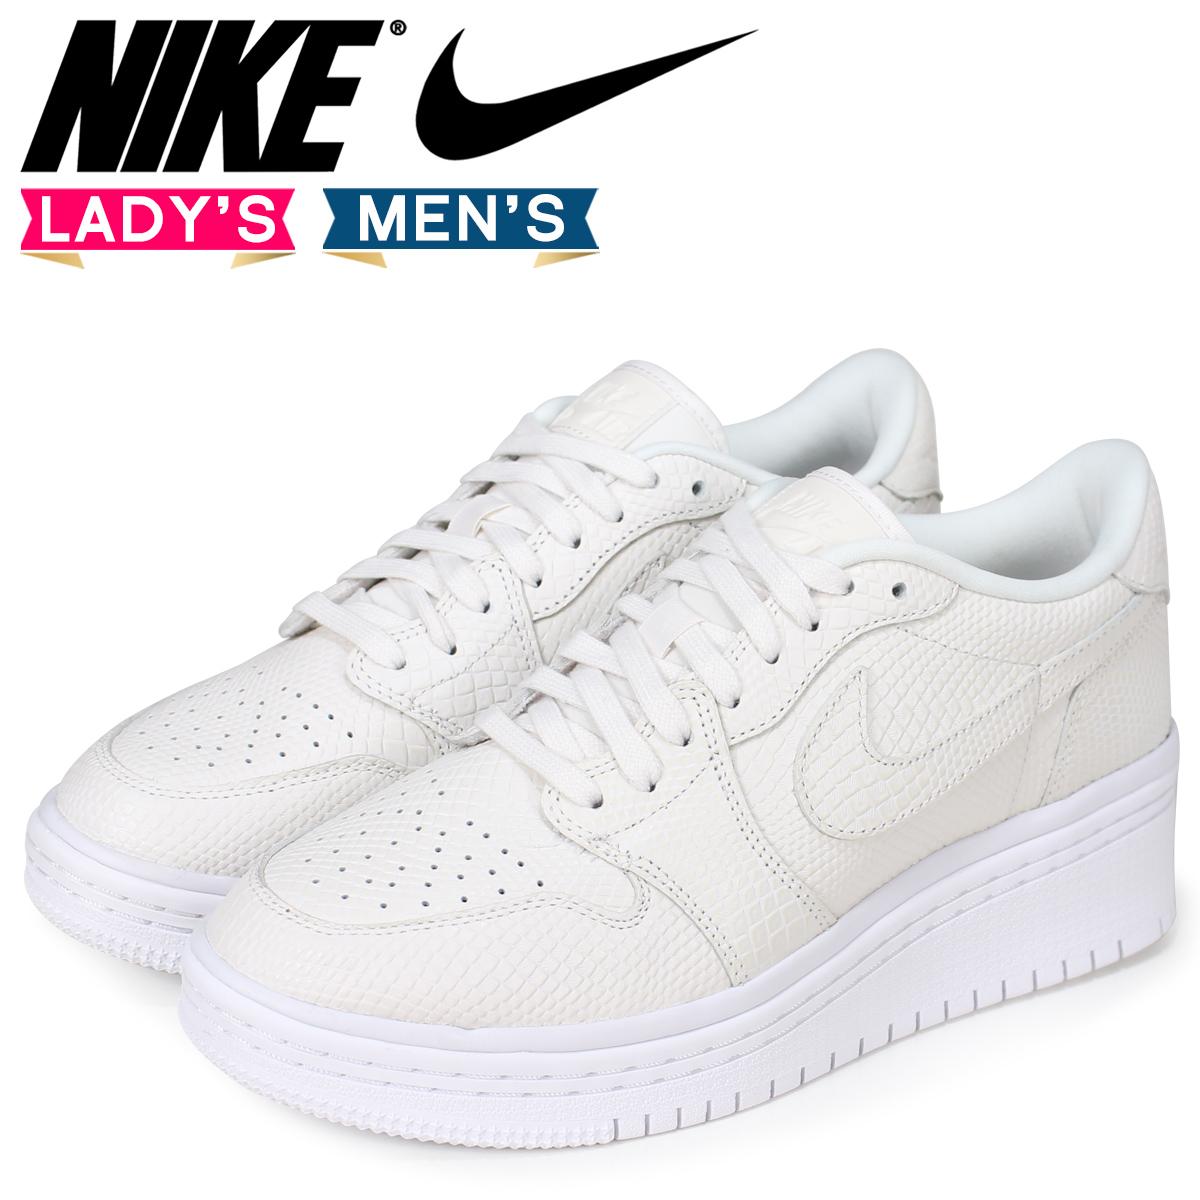 0c244330256 NIKE Nike Air Jordan 1 lady s men s sneakers WMNS AIR JORDAN 1 RE LOW LIFTD  AO1334-004 off-white  load planned Shinnyu load in reservation product 7 13  ...